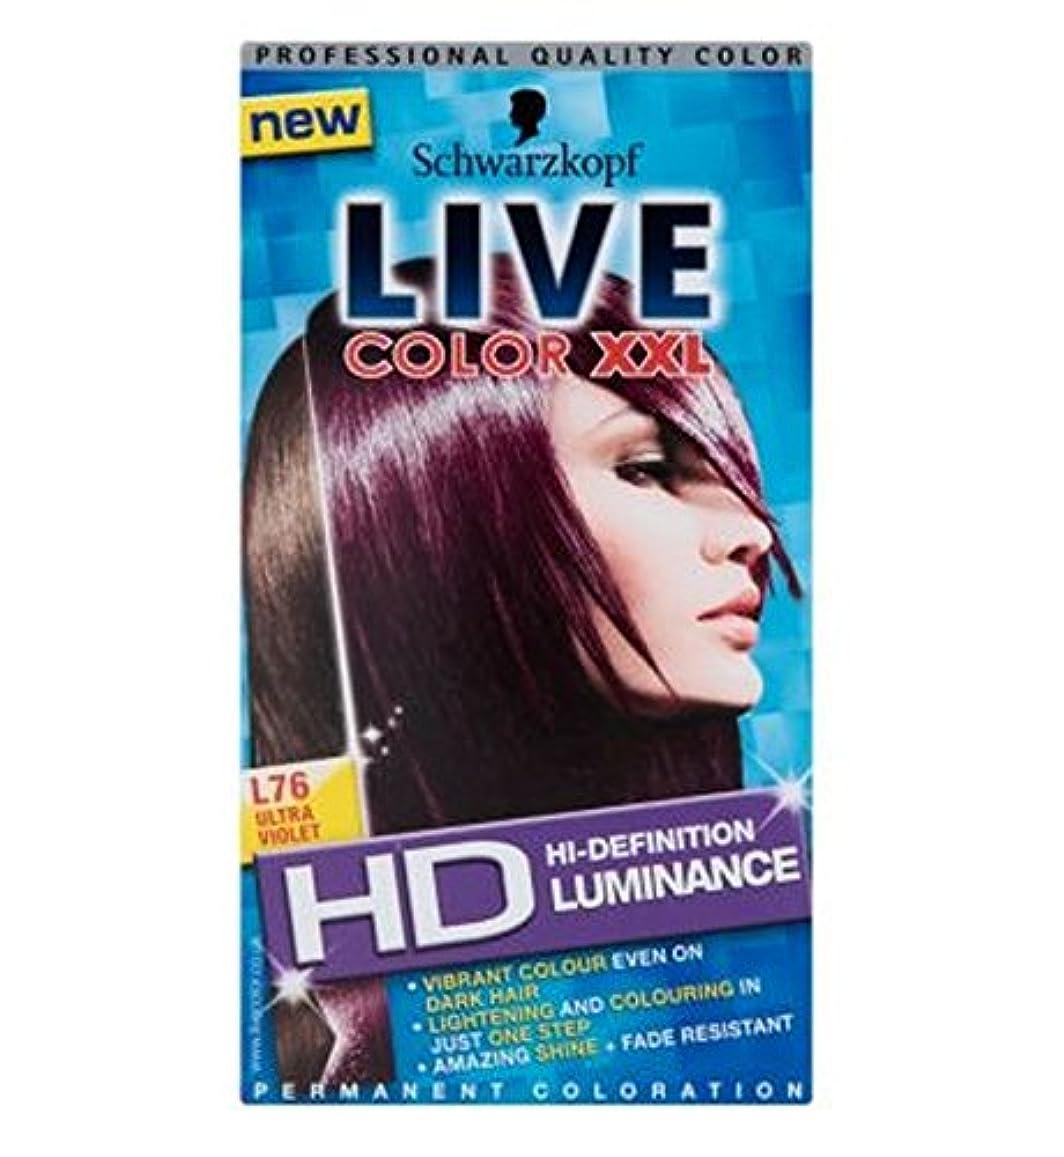 Schwarzkopf Live XXL HD Luminance Ultra Violet L76 - シュワルツコフライブXxlのHd輝度紫外線L76 (Schwarzkopf) [並行輸入品]